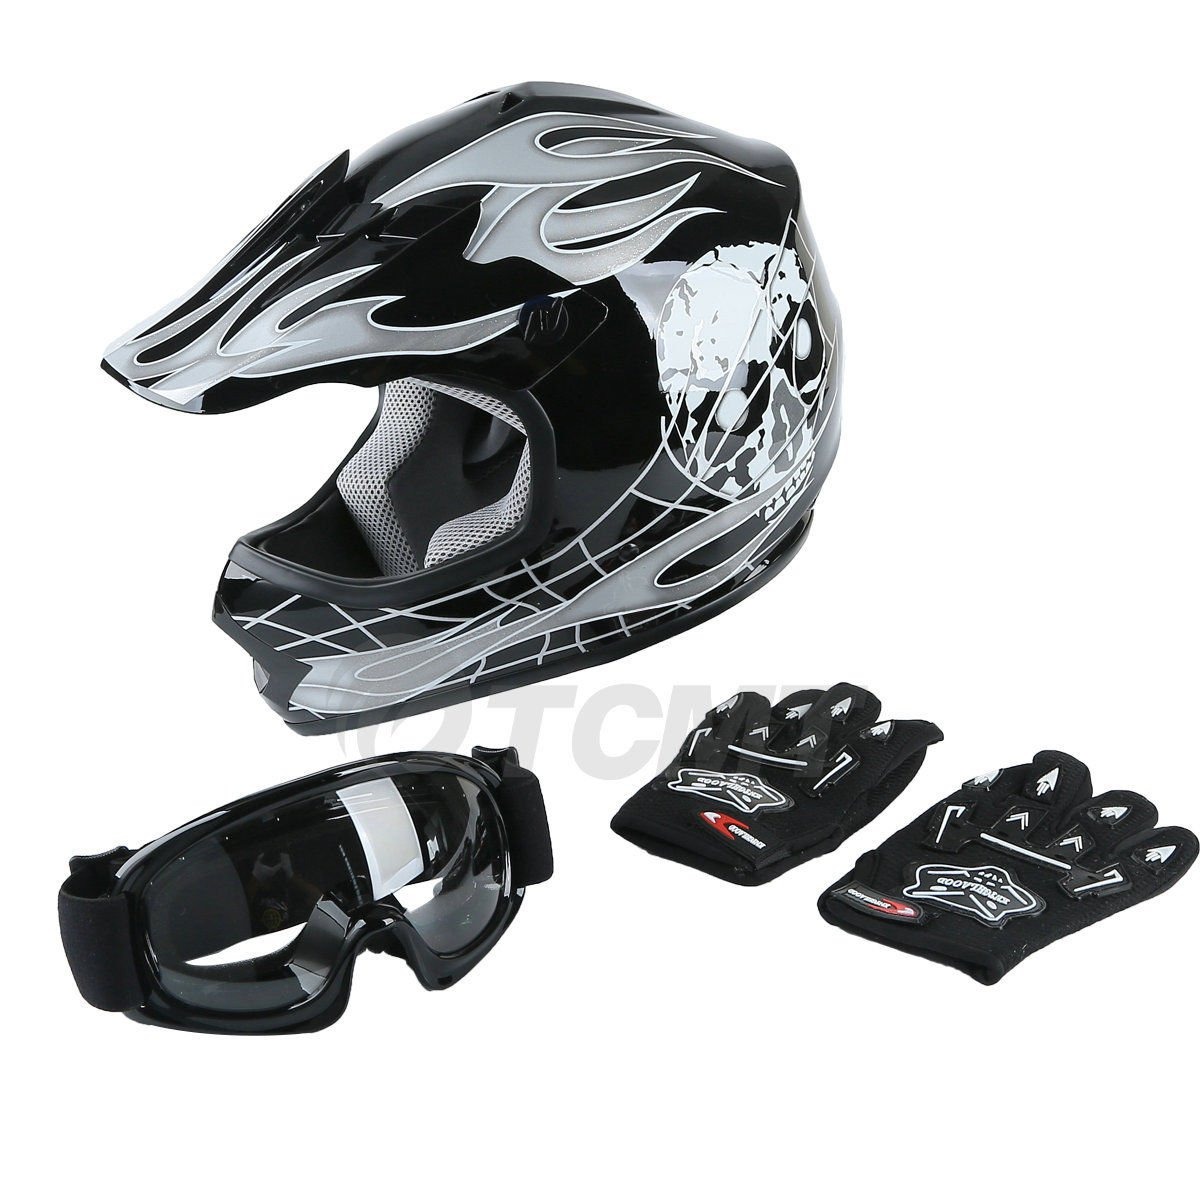 TCMT Dot Youth & Kids Motocross Offroad Street Helmet Pink Butterfly Motorcycle Helmet White Dirt Bike Dirt Bike Helmet+Goggles+gloves L XF270205-L